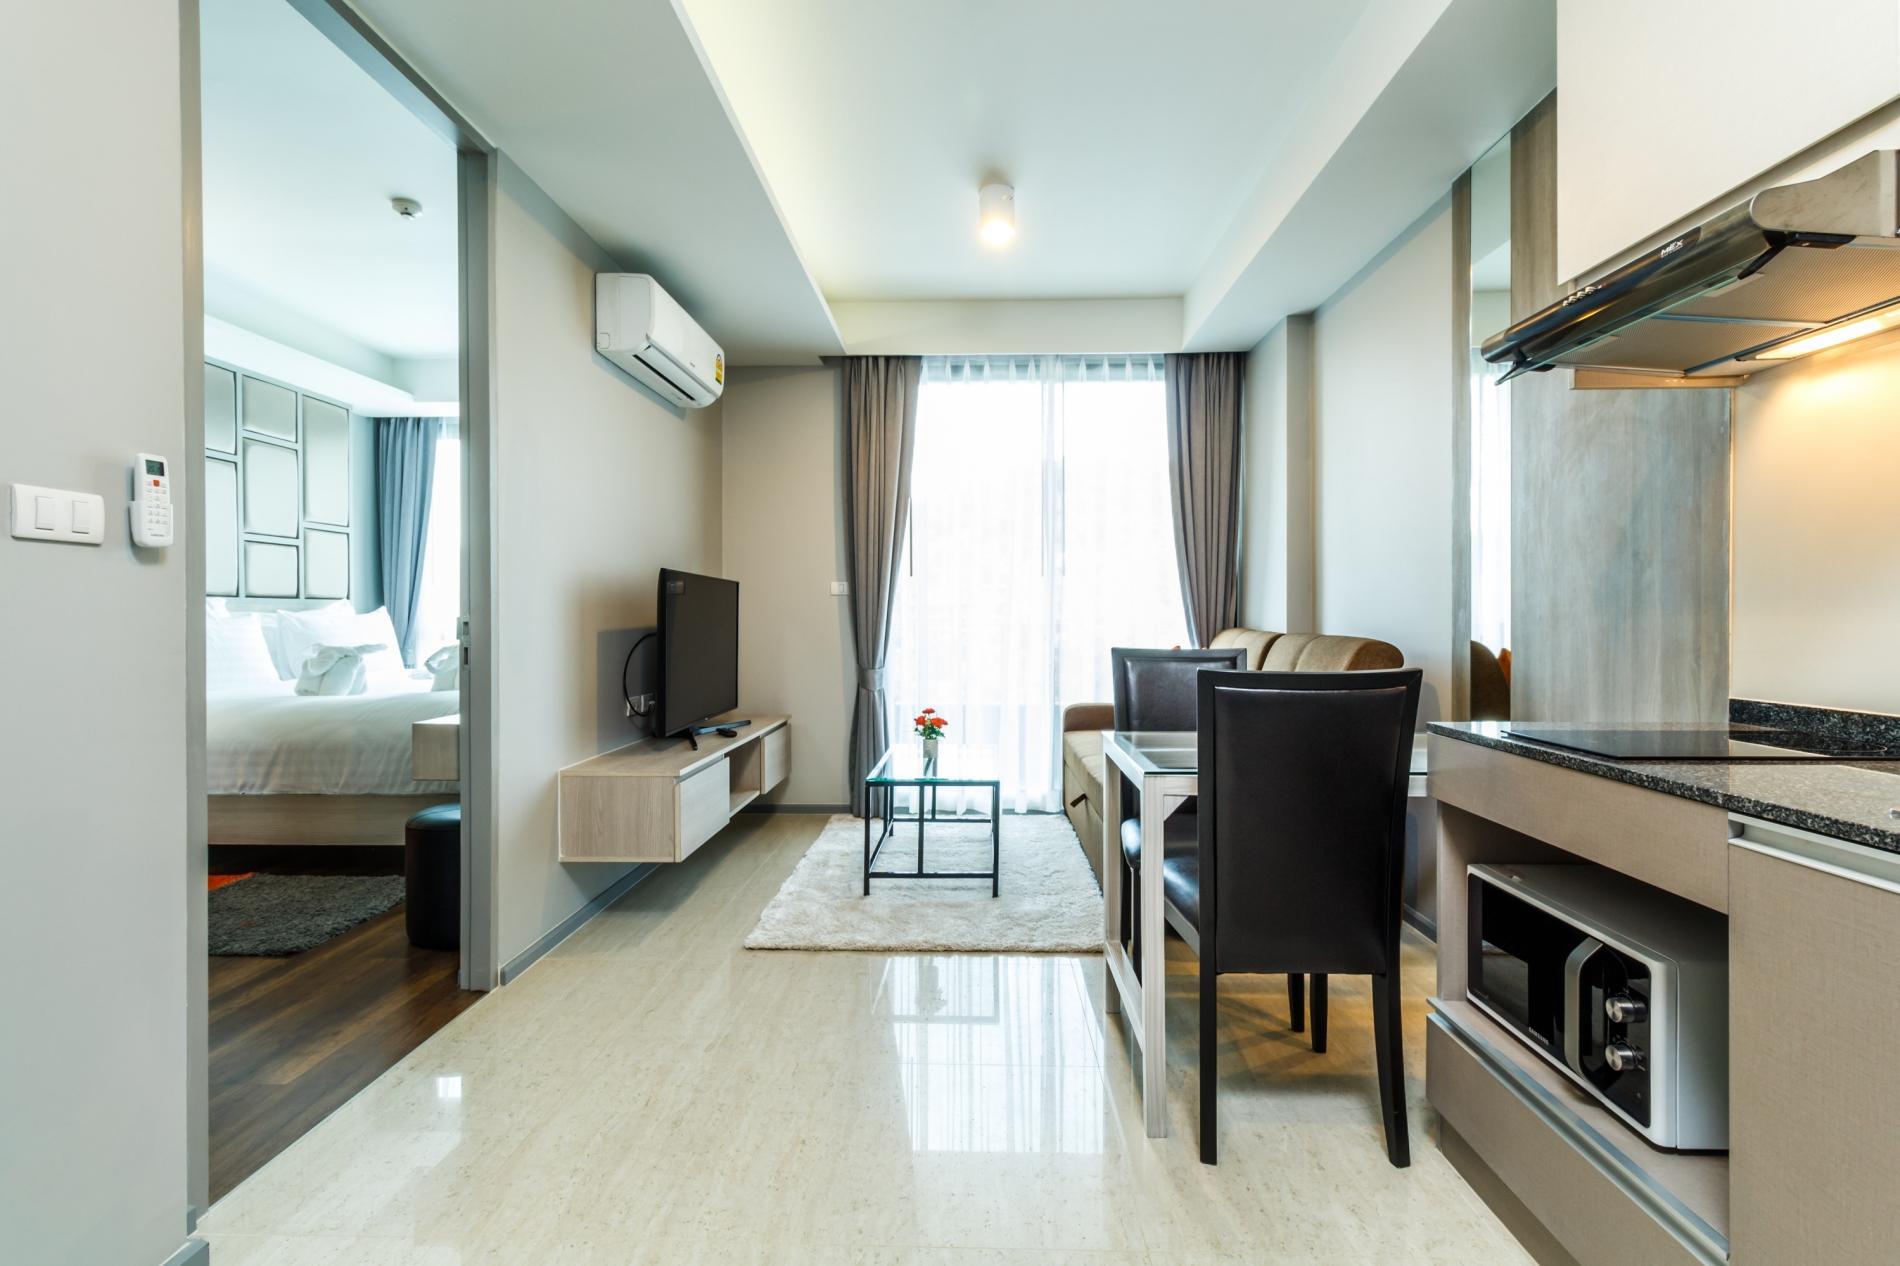 Apartment 6Av 703 - Large apartment in Surin beach photo 20396159